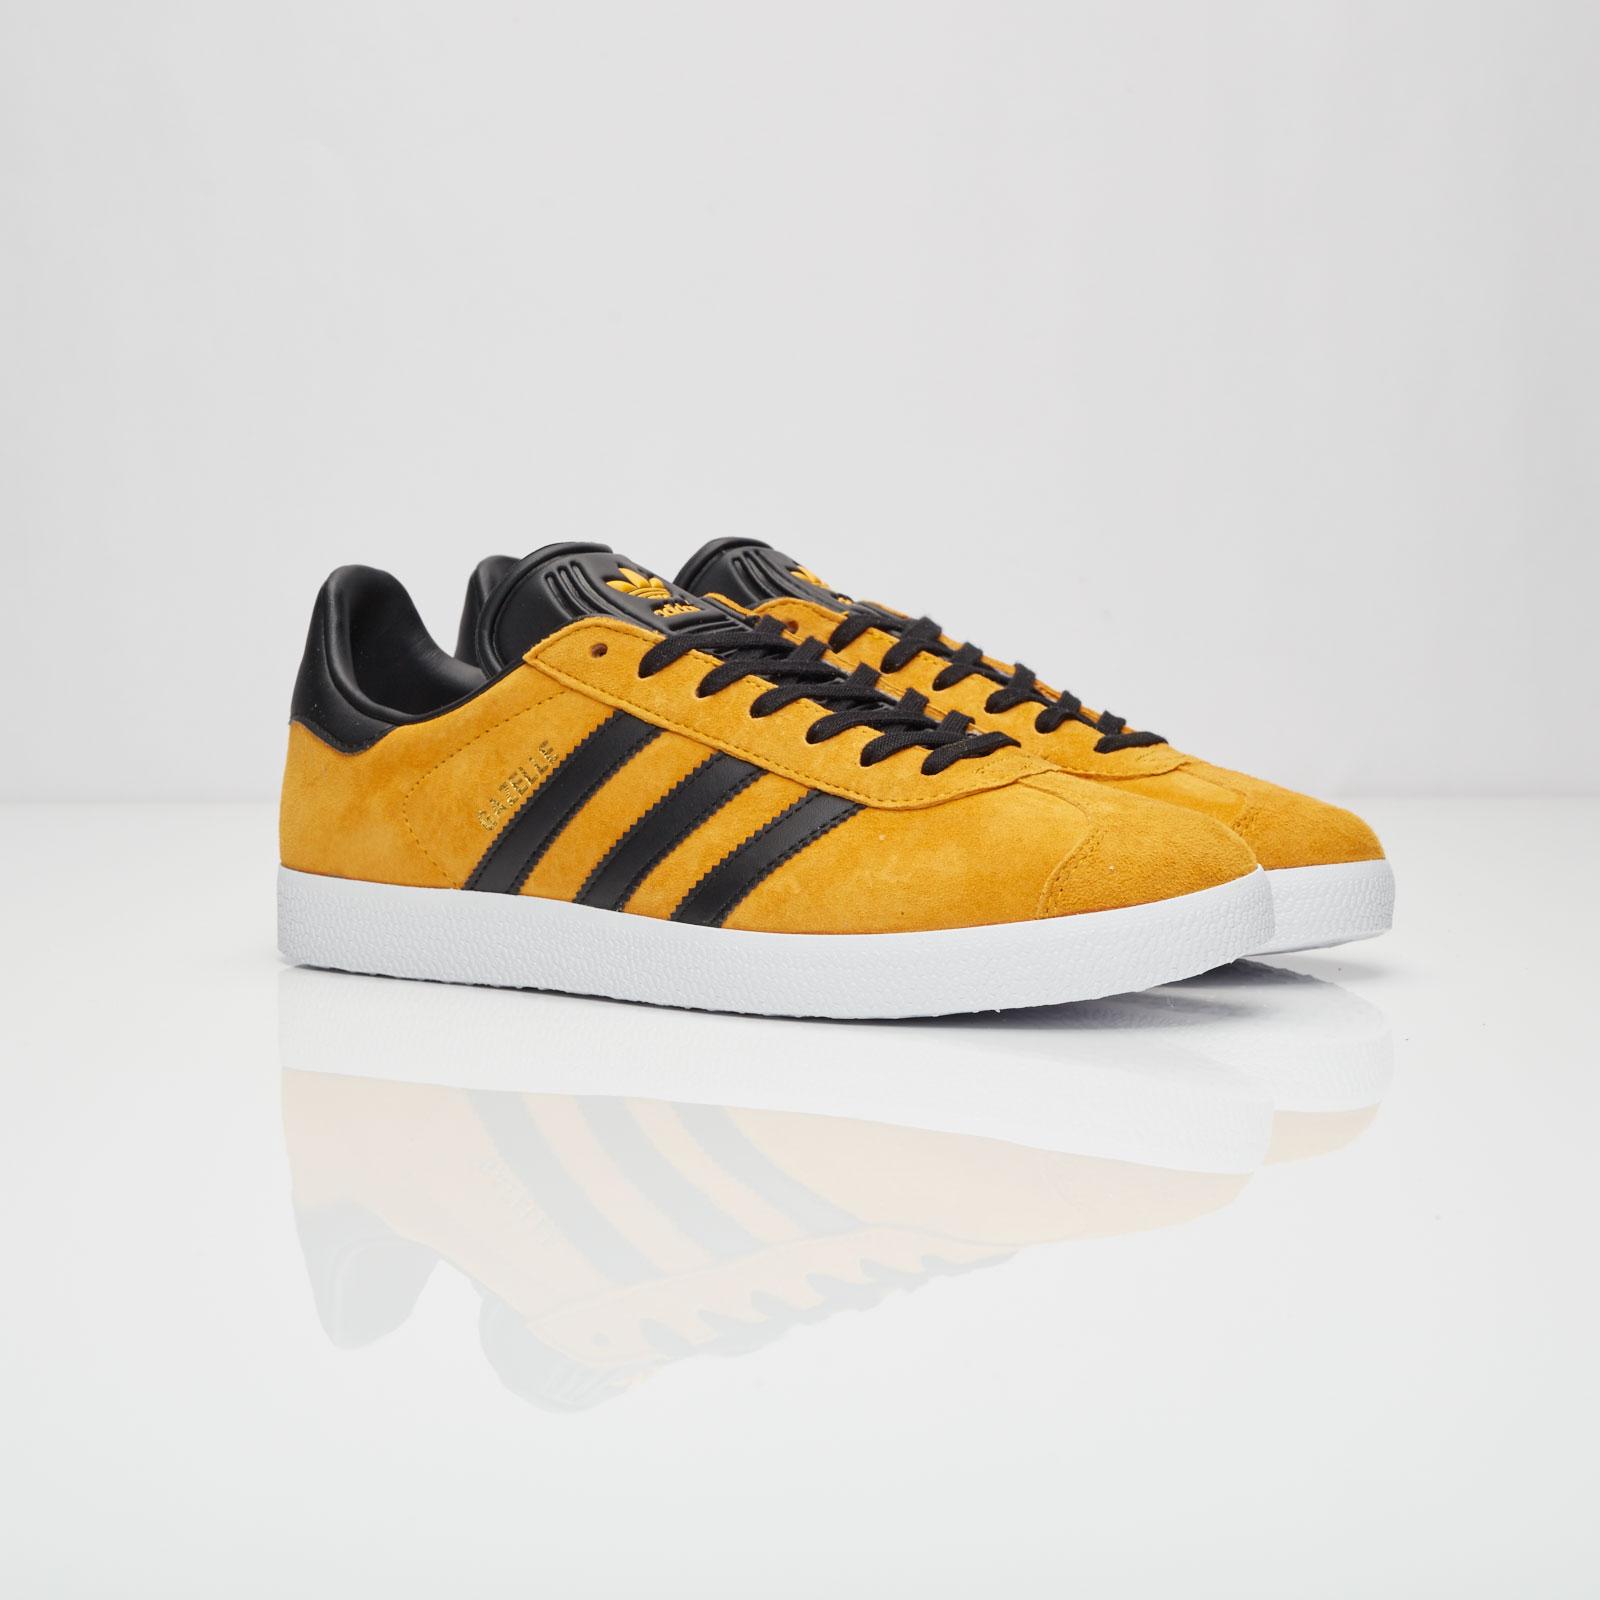 new product 39539 8140d adidas Gazelle - S79979 - Sneakersnstuff  sneakers  streetwe